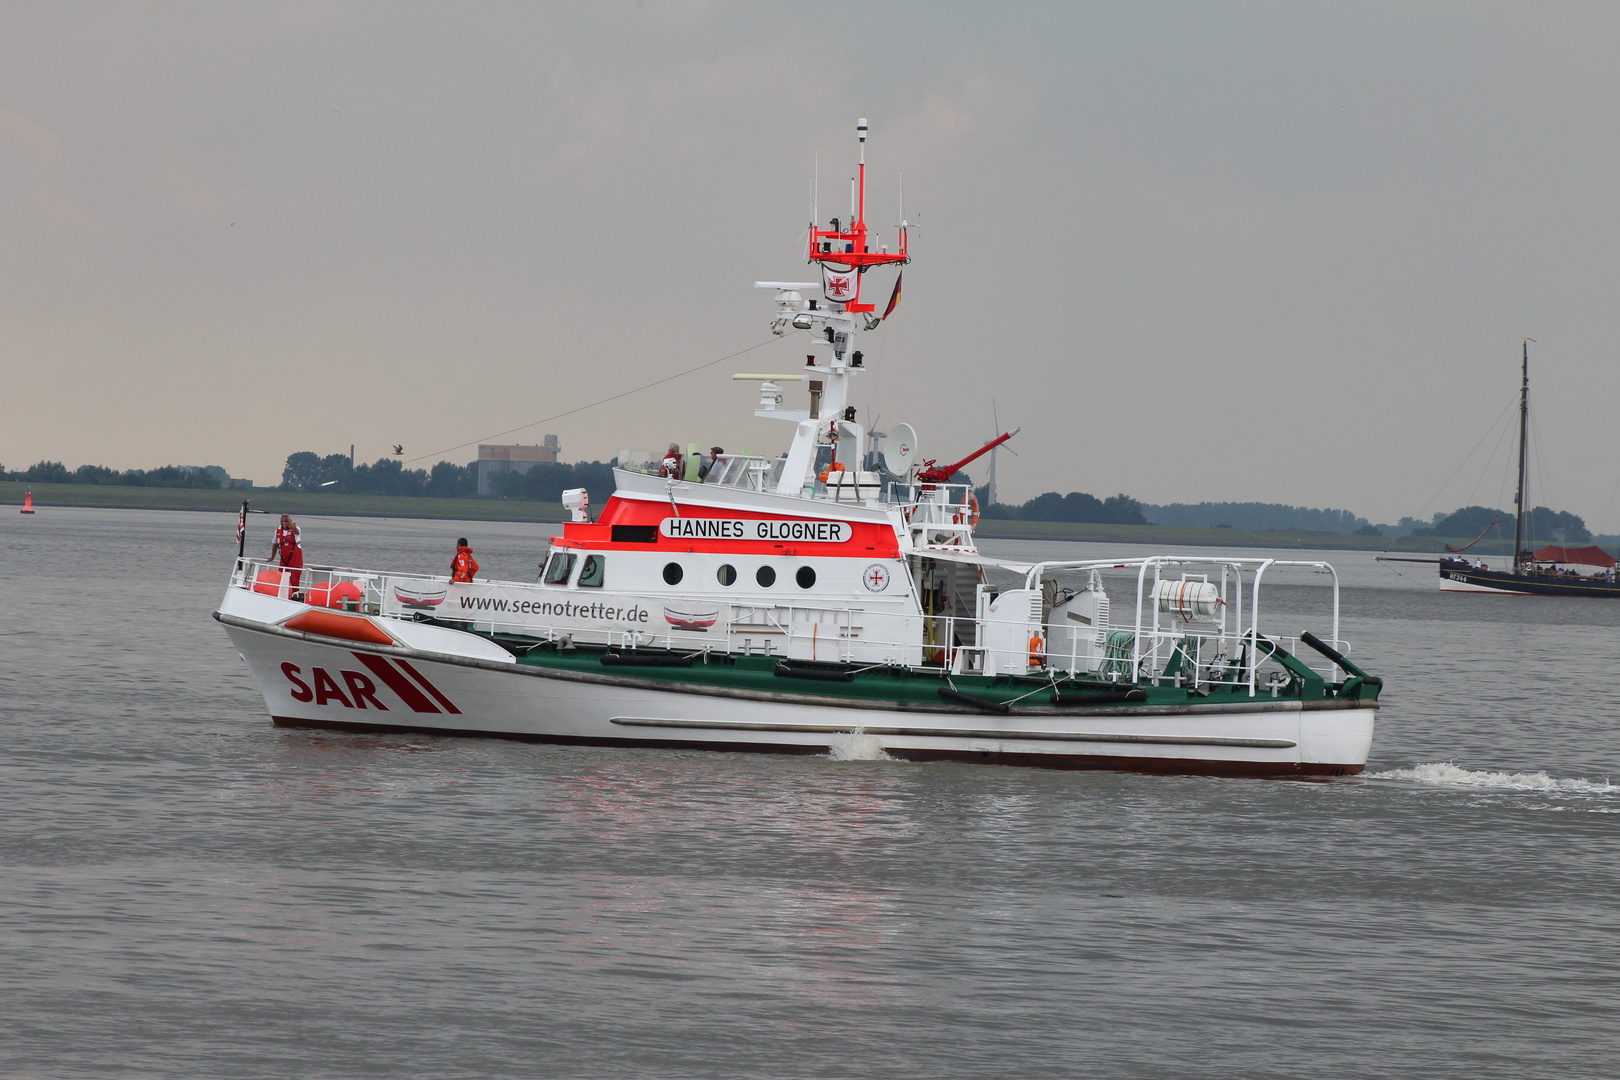 SAR in Bremerhaven